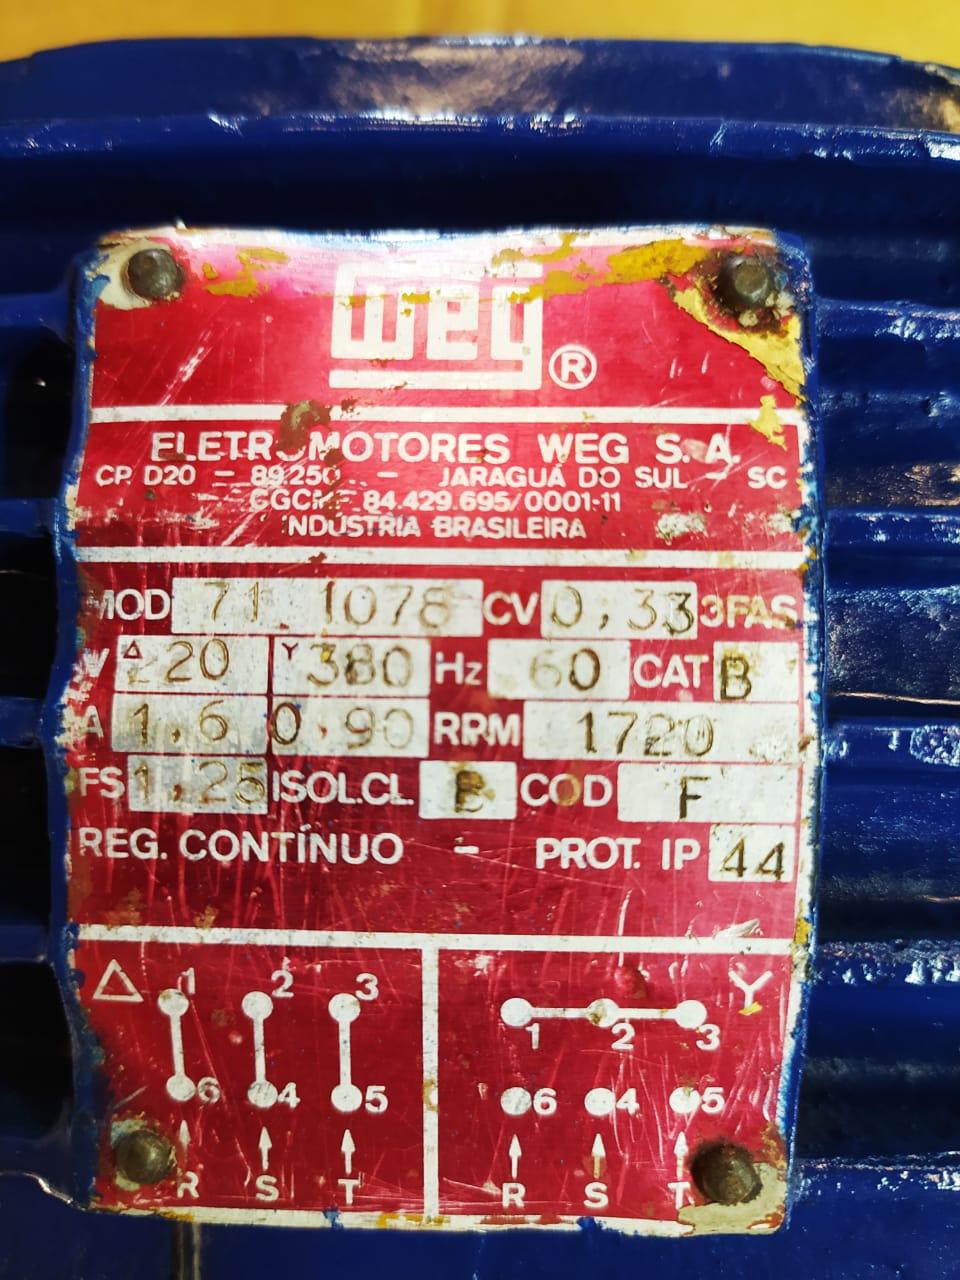 Motor Weg Trifásico 0.33CV 0.25KW 4 Polos 1740Rpm Blindado 220V 380V Usado